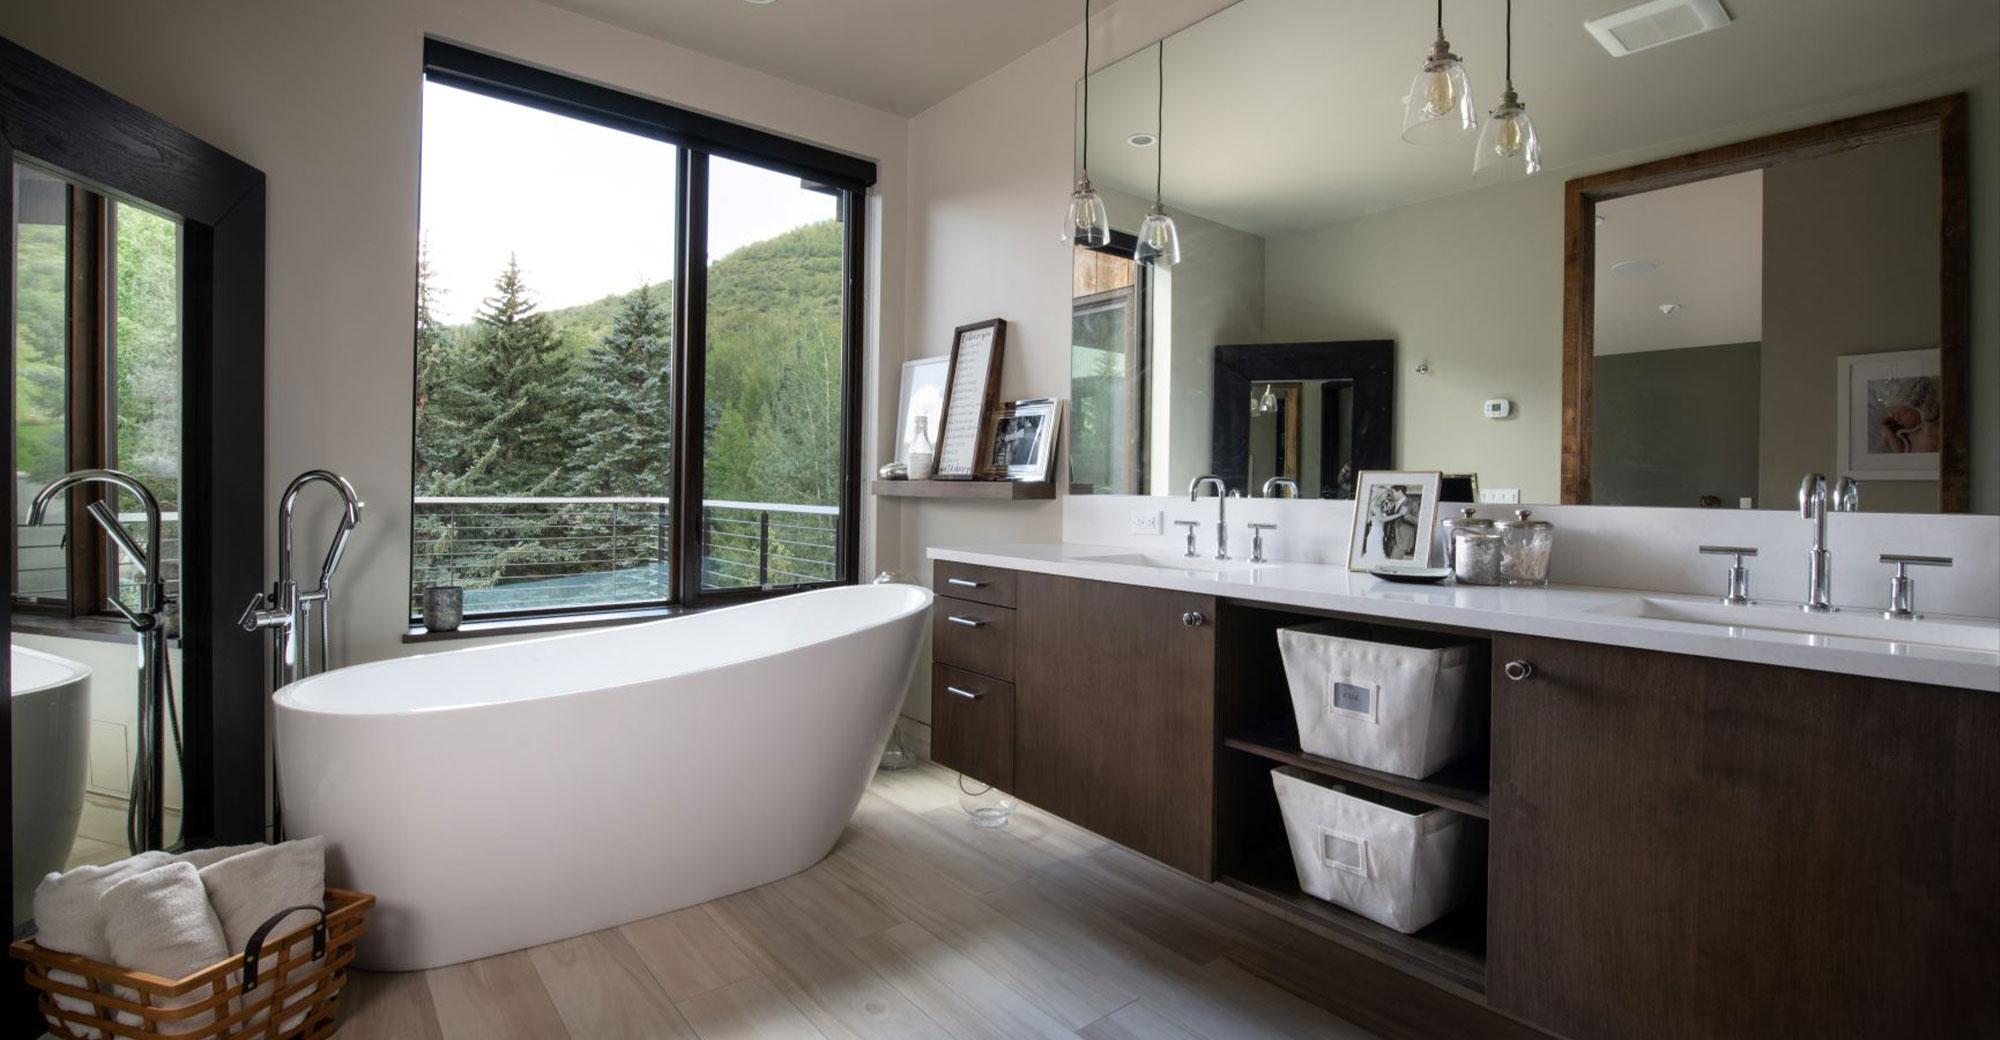 Chamonix Vail New Construction Bathroom 1